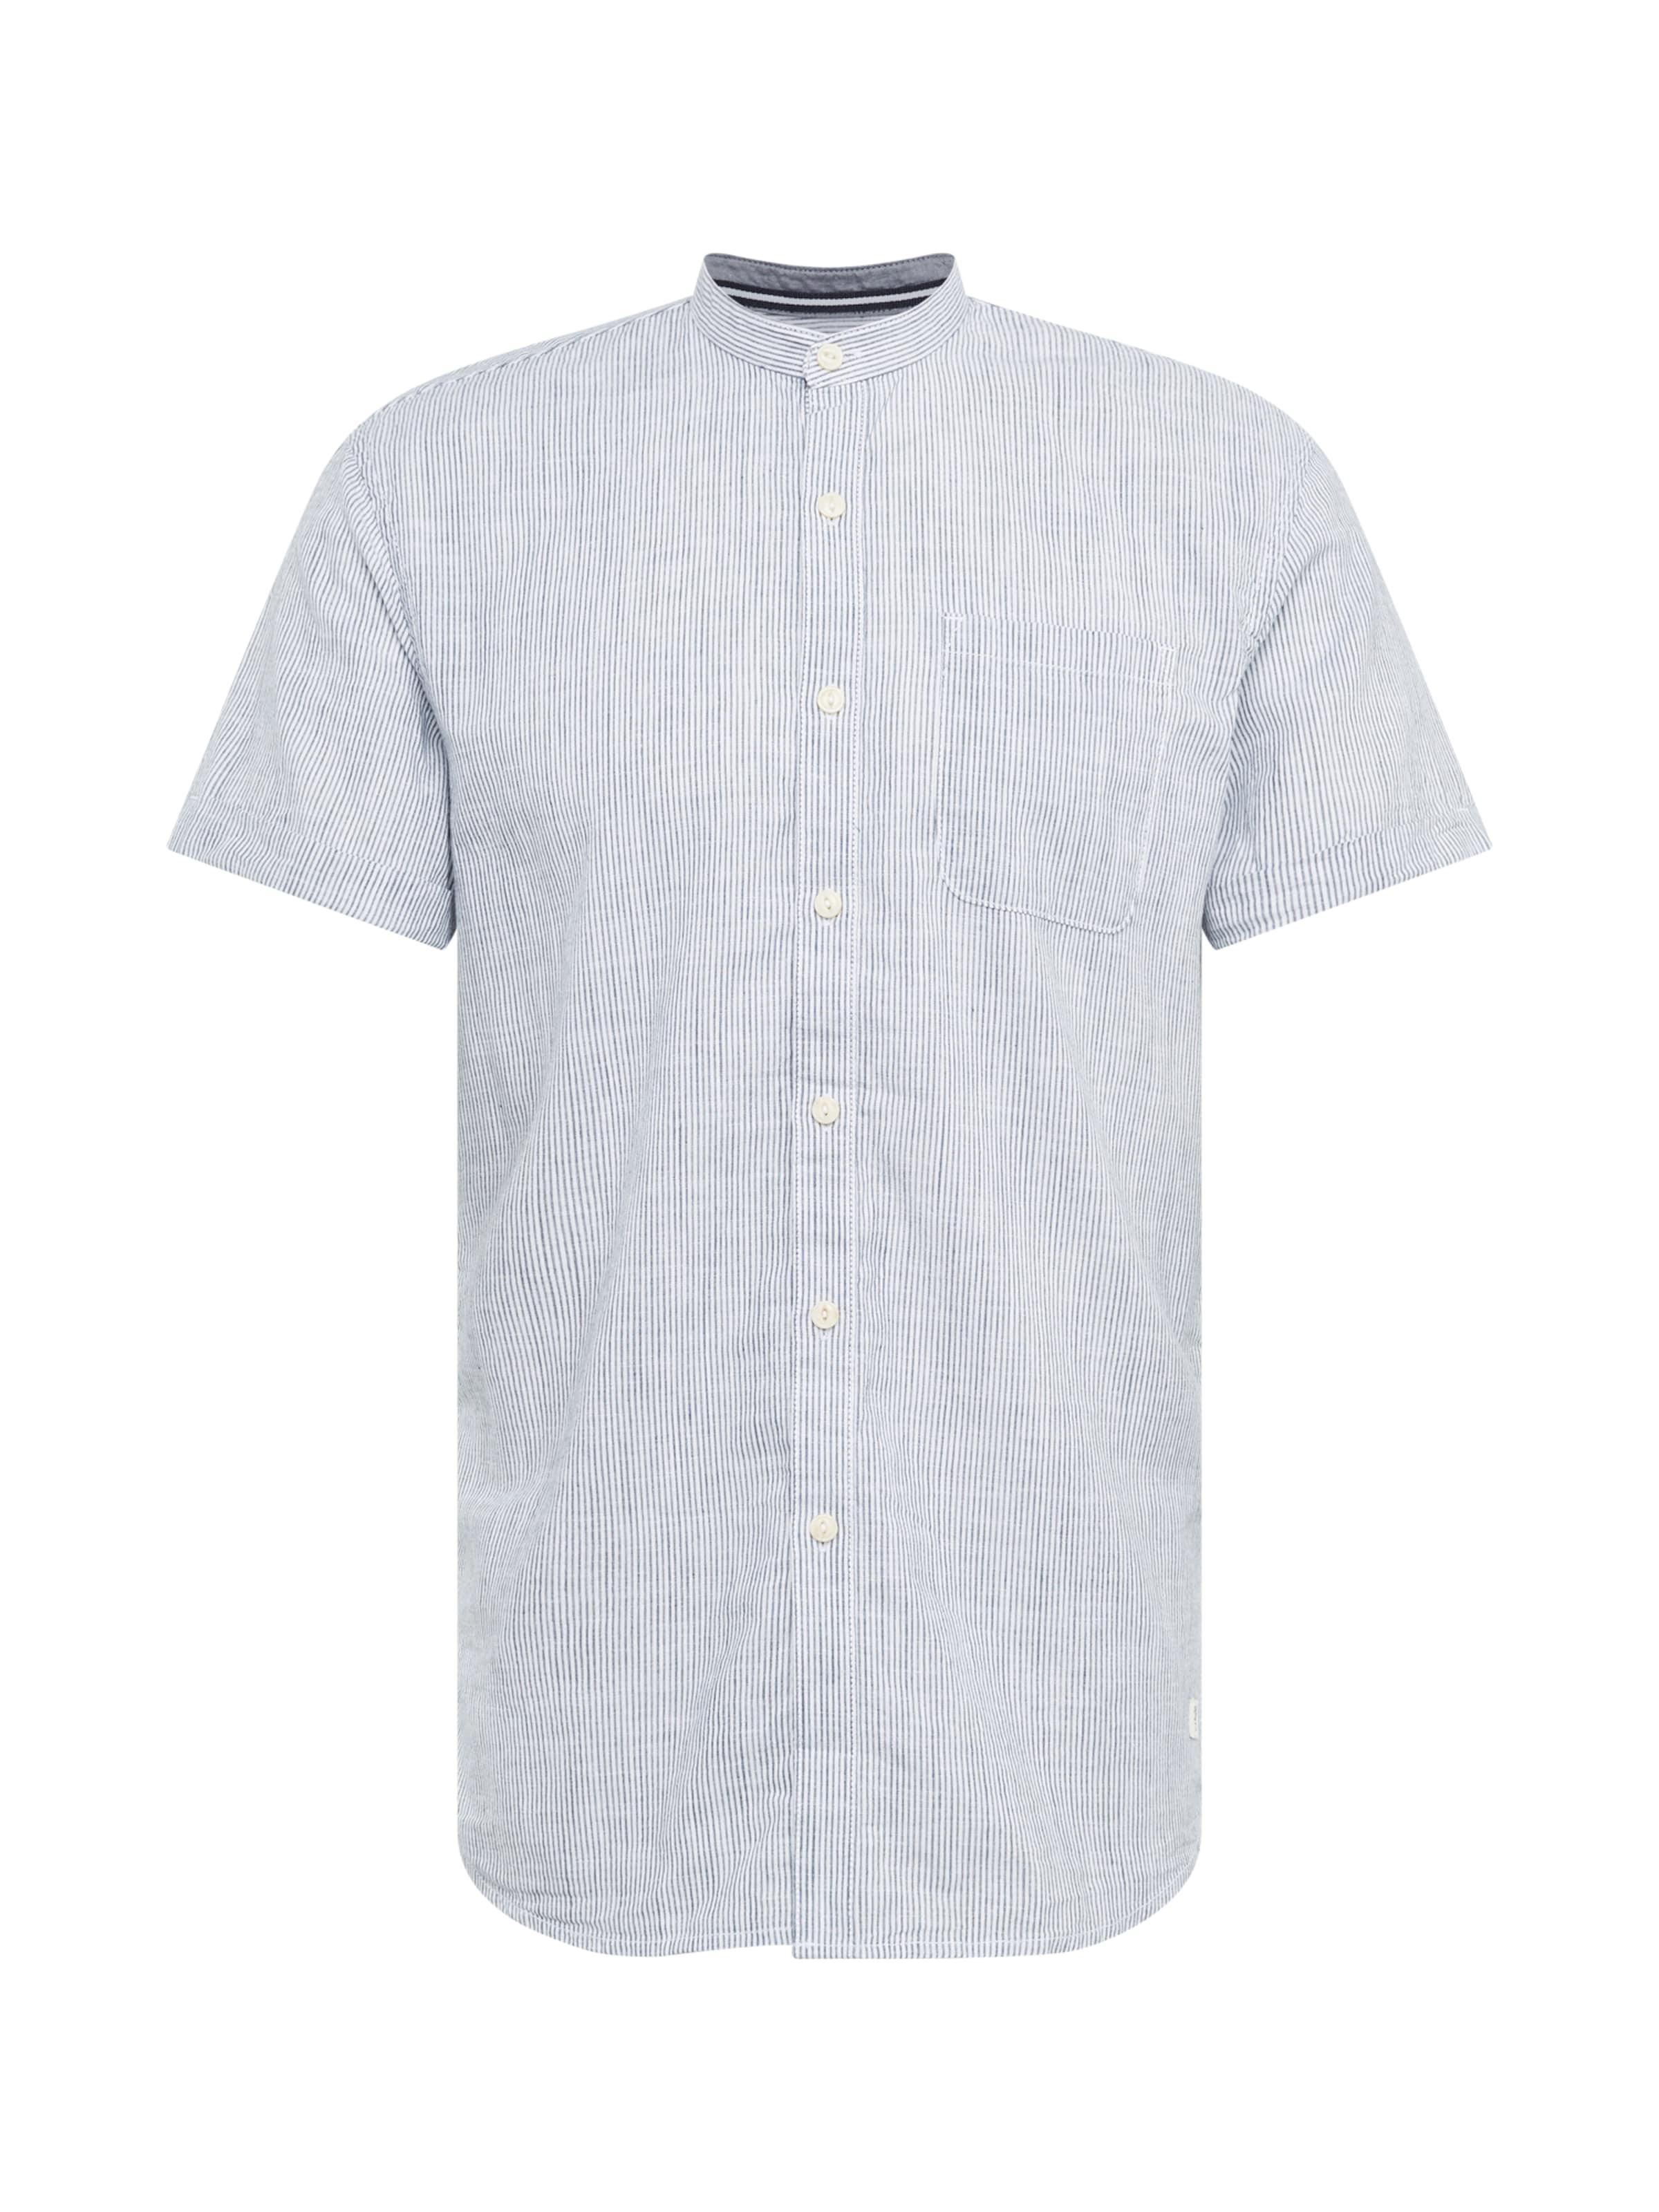 BlauWeiß Hemd Tom Tailor In Denim TFKJ3l1cu